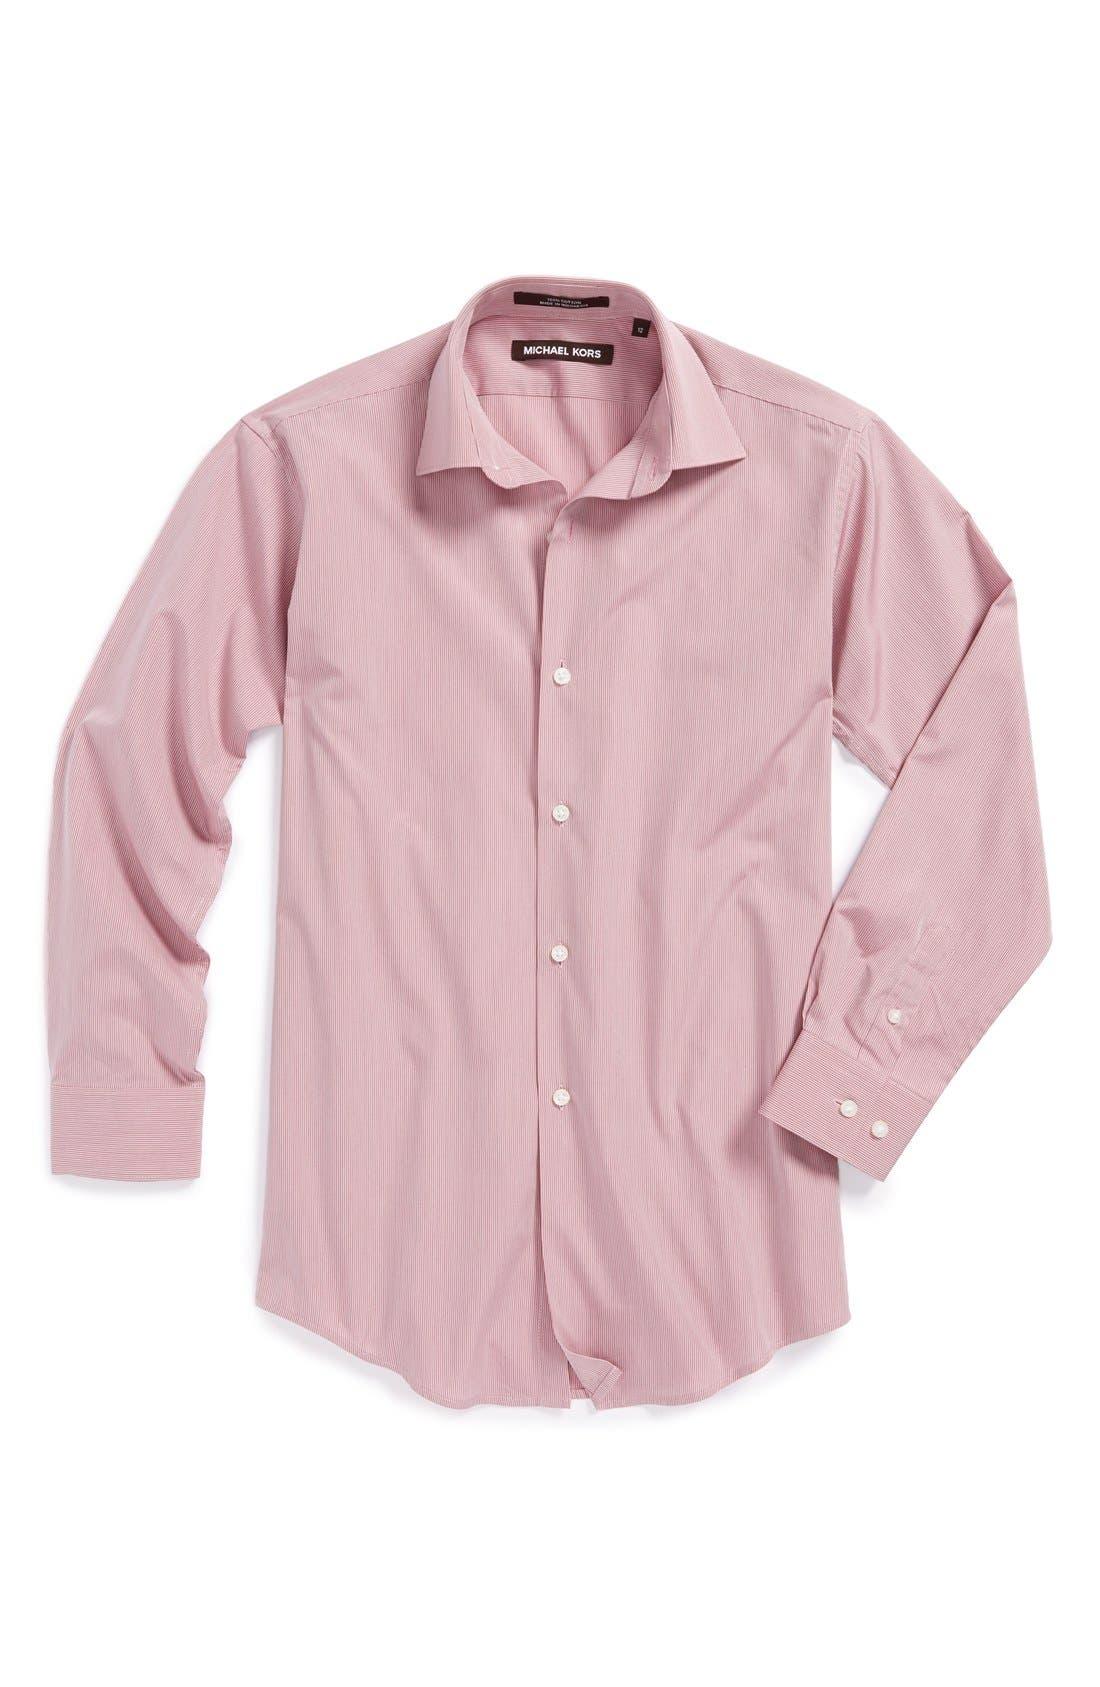 Alternate Image 1 Selected - Michael Kors Stripe Dress Shirt (Big Boys)